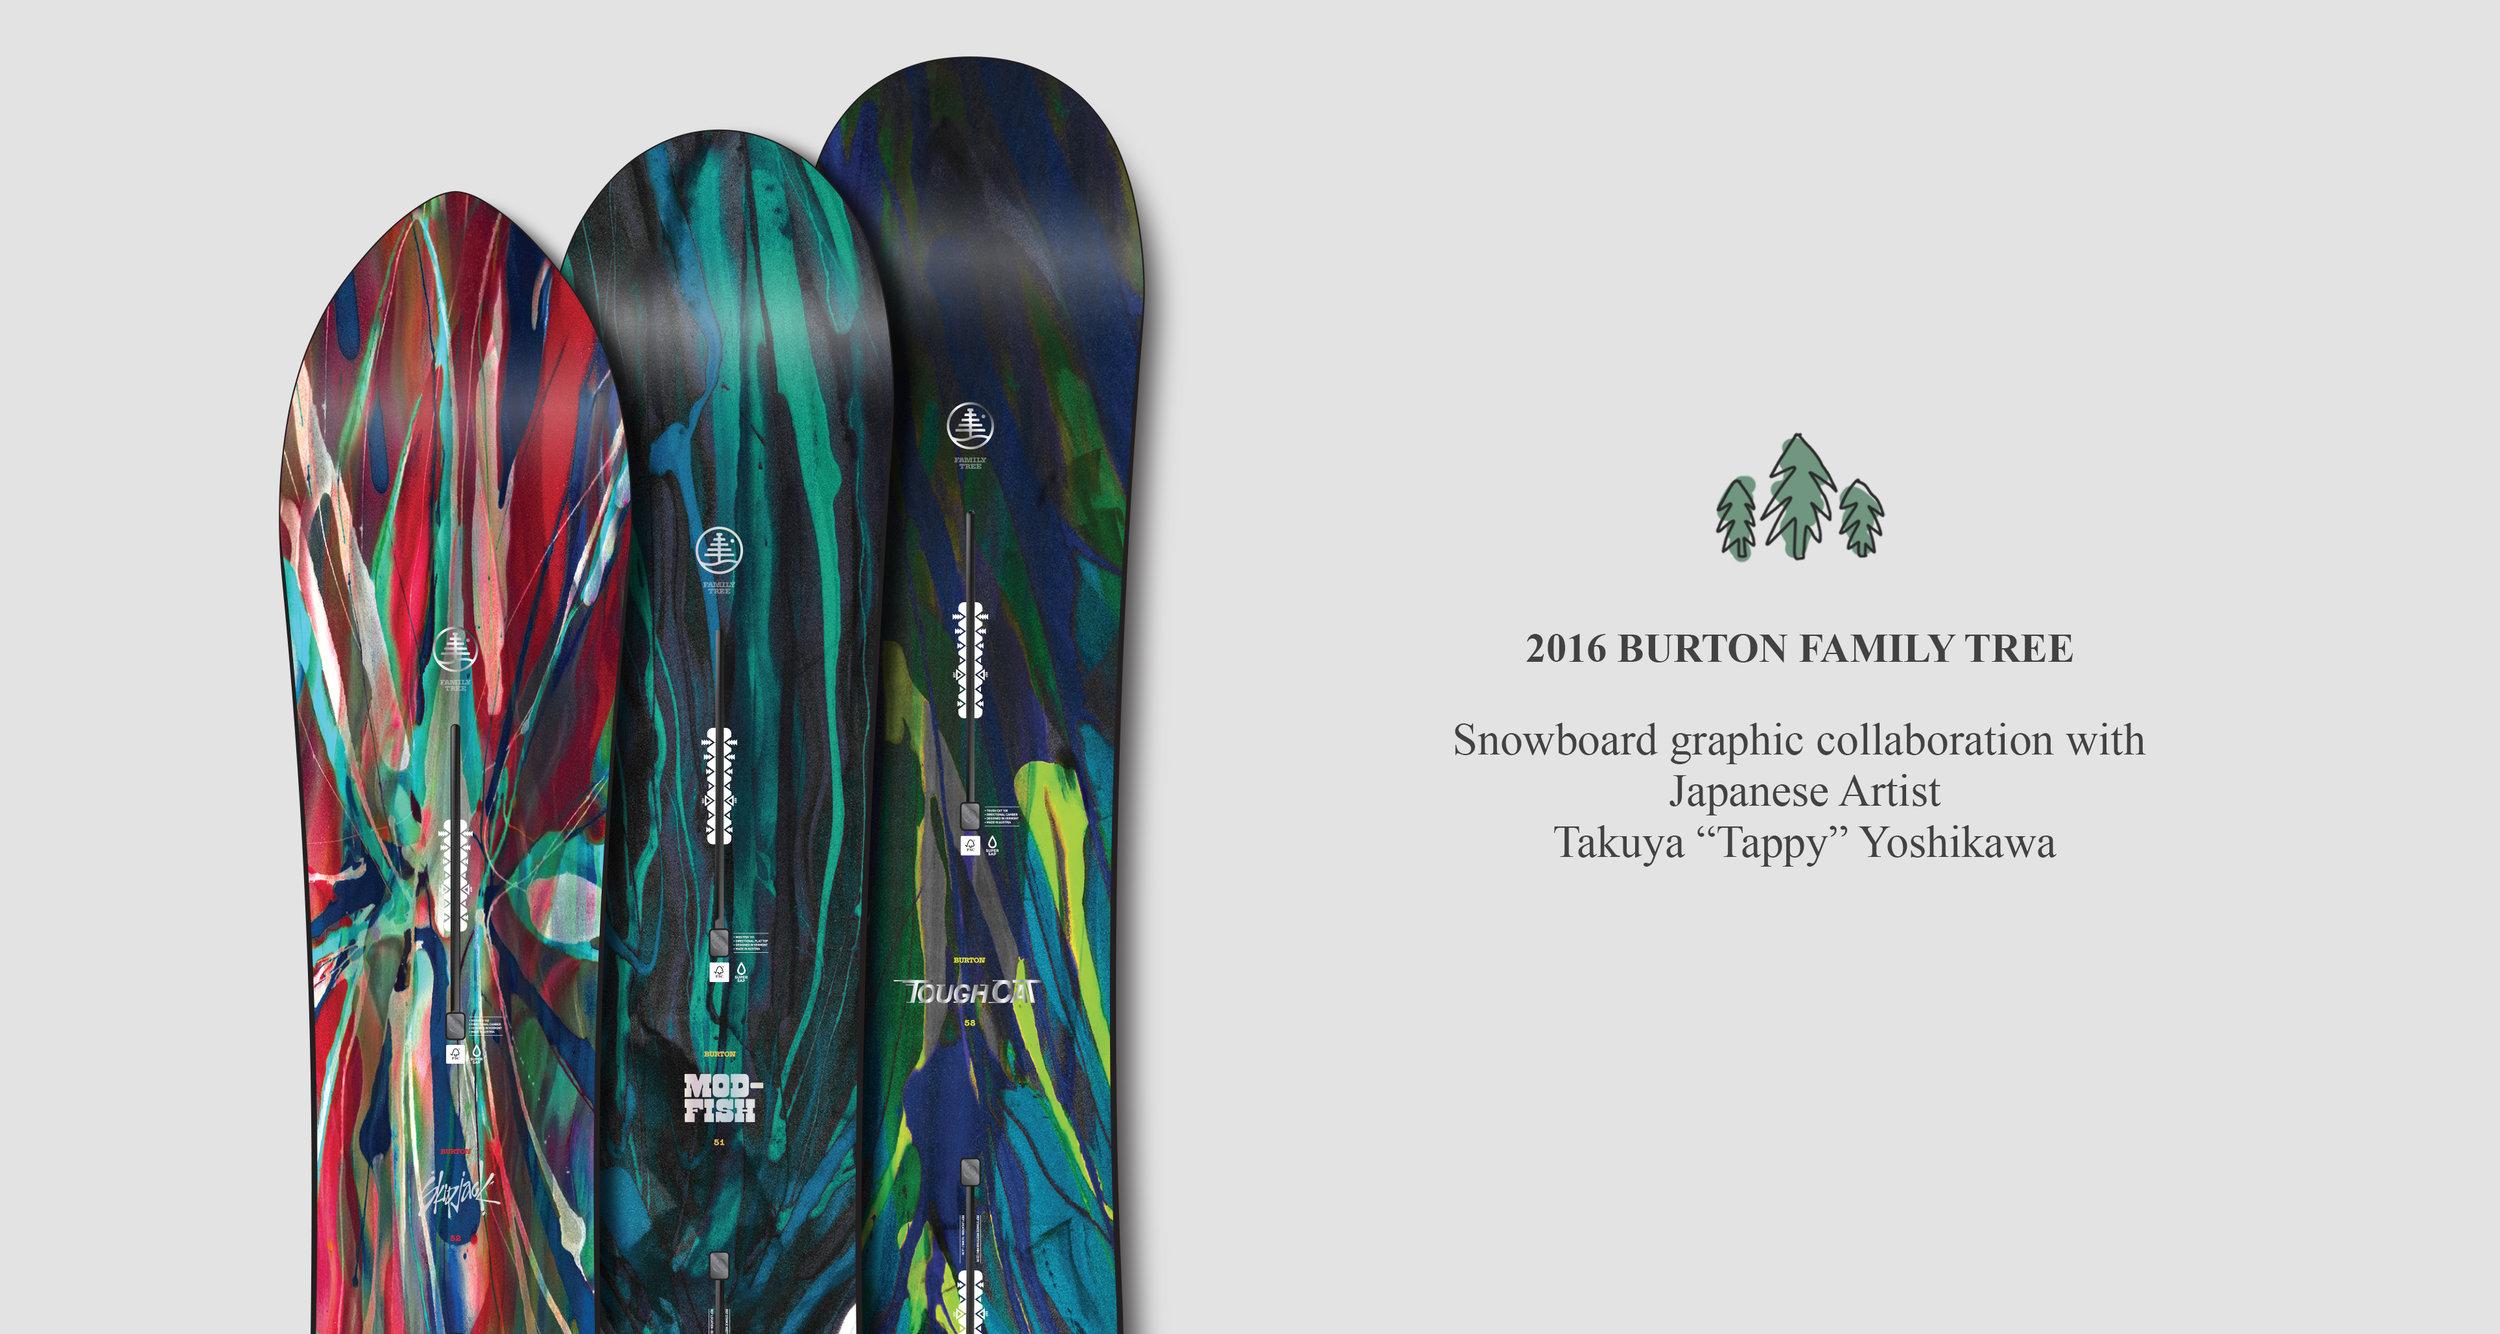 2016 BURTON FAMILY TREE